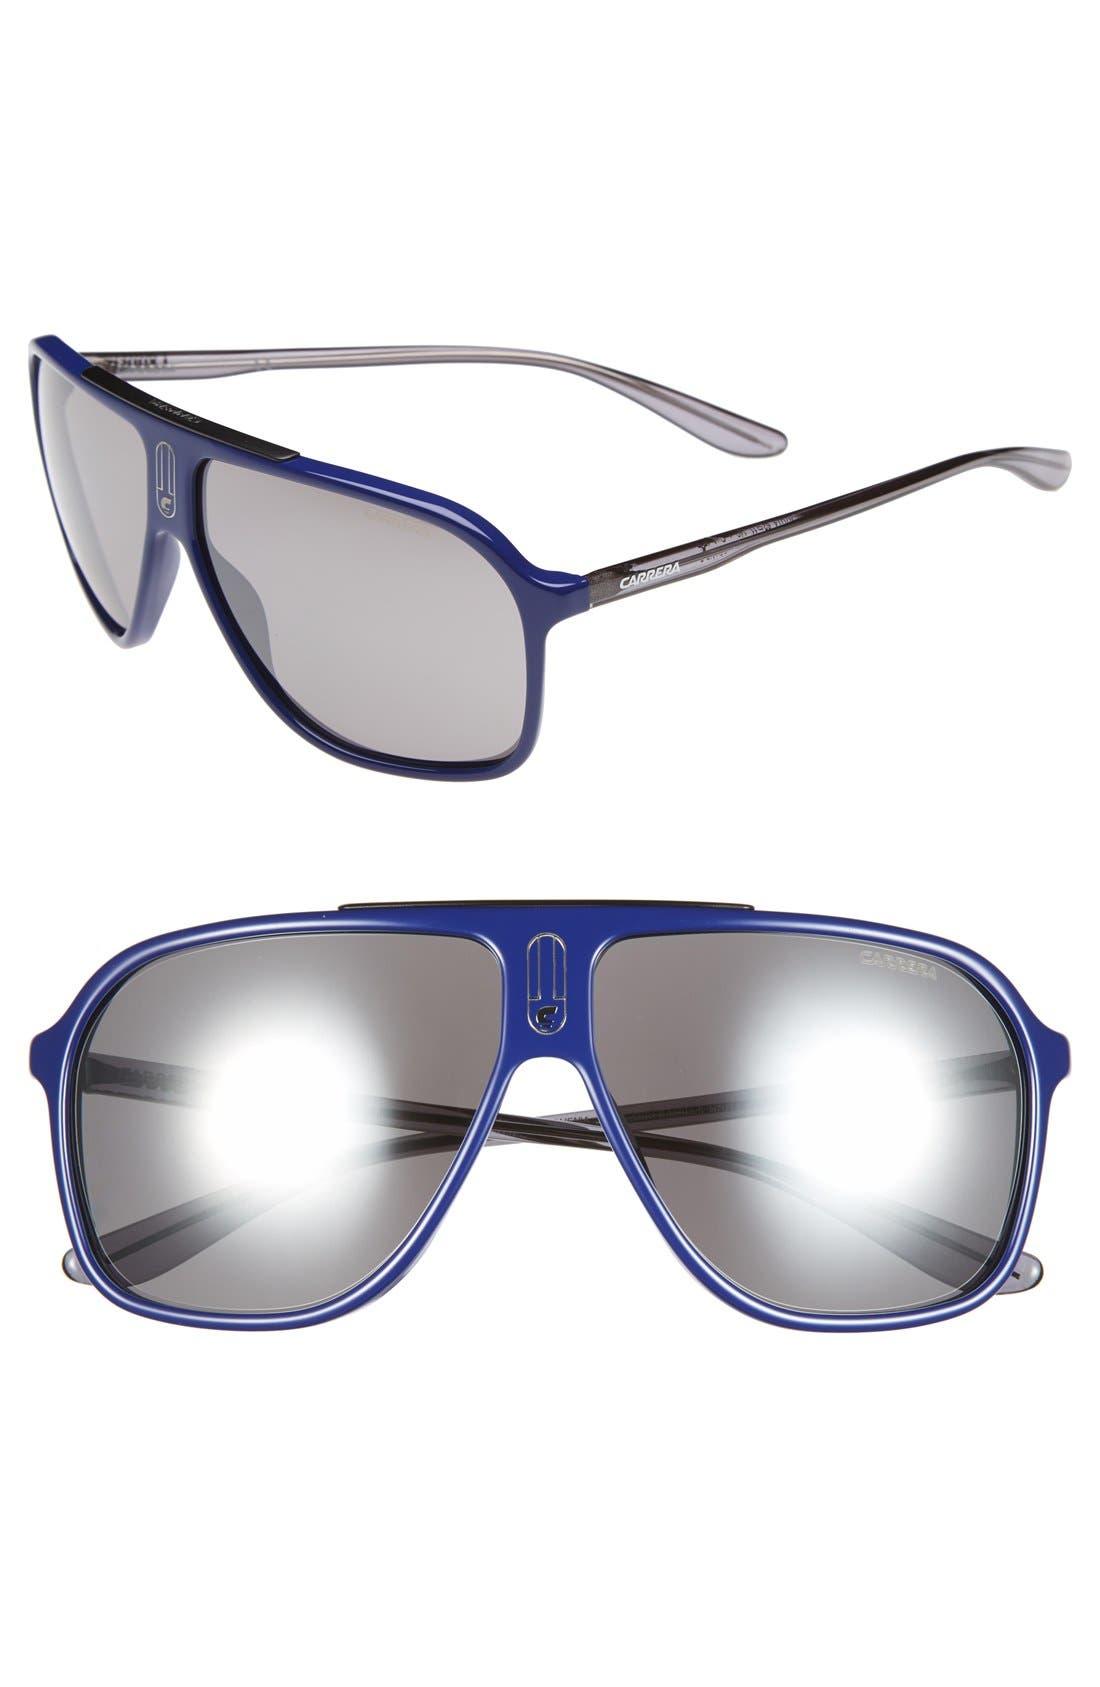 62mm Sunglasses,                         Main,                         color, Blue Grey/ Black Mirror